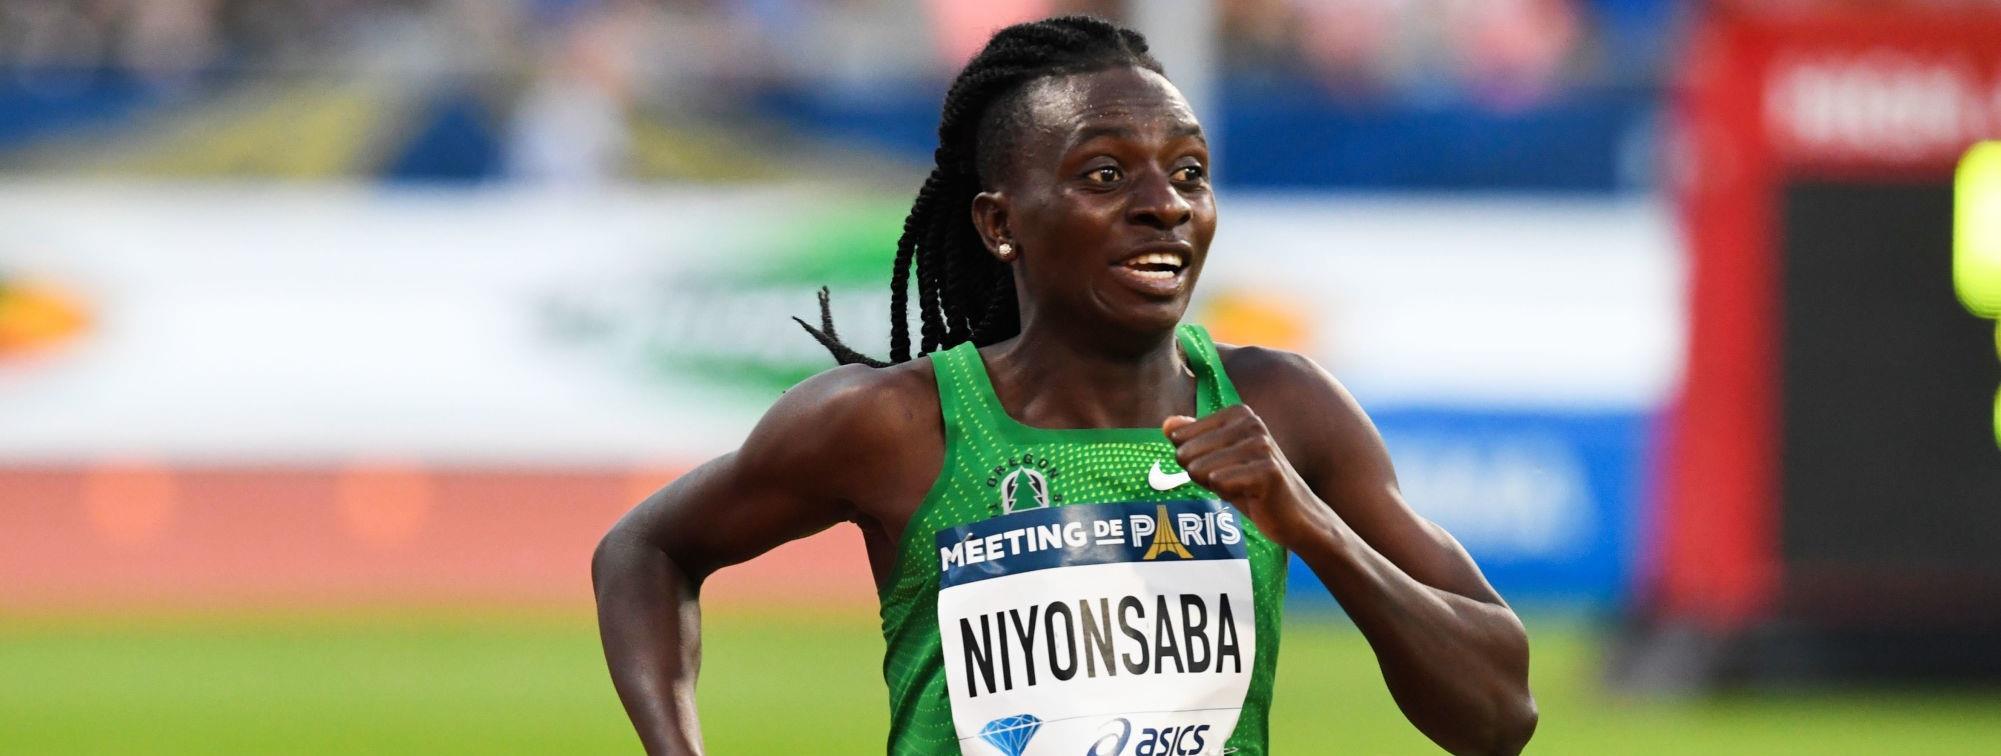 Athlétisme: La Burundaise Niyonsaba bat le record du monde 2000 m